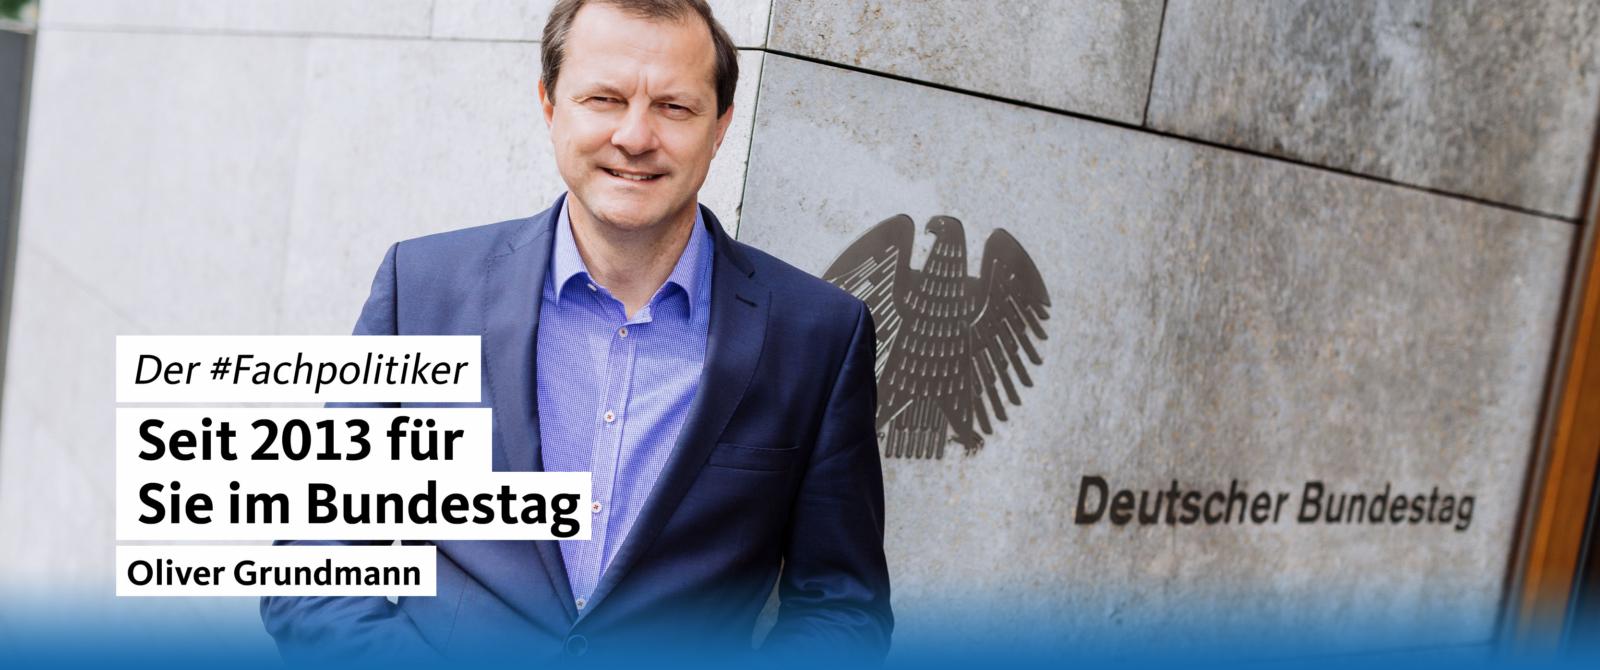 2-bundestagswahl-2021-stade-rotenburg-bremervoerde-oliver-grundmann-cdu-fachpolitiker-berlin